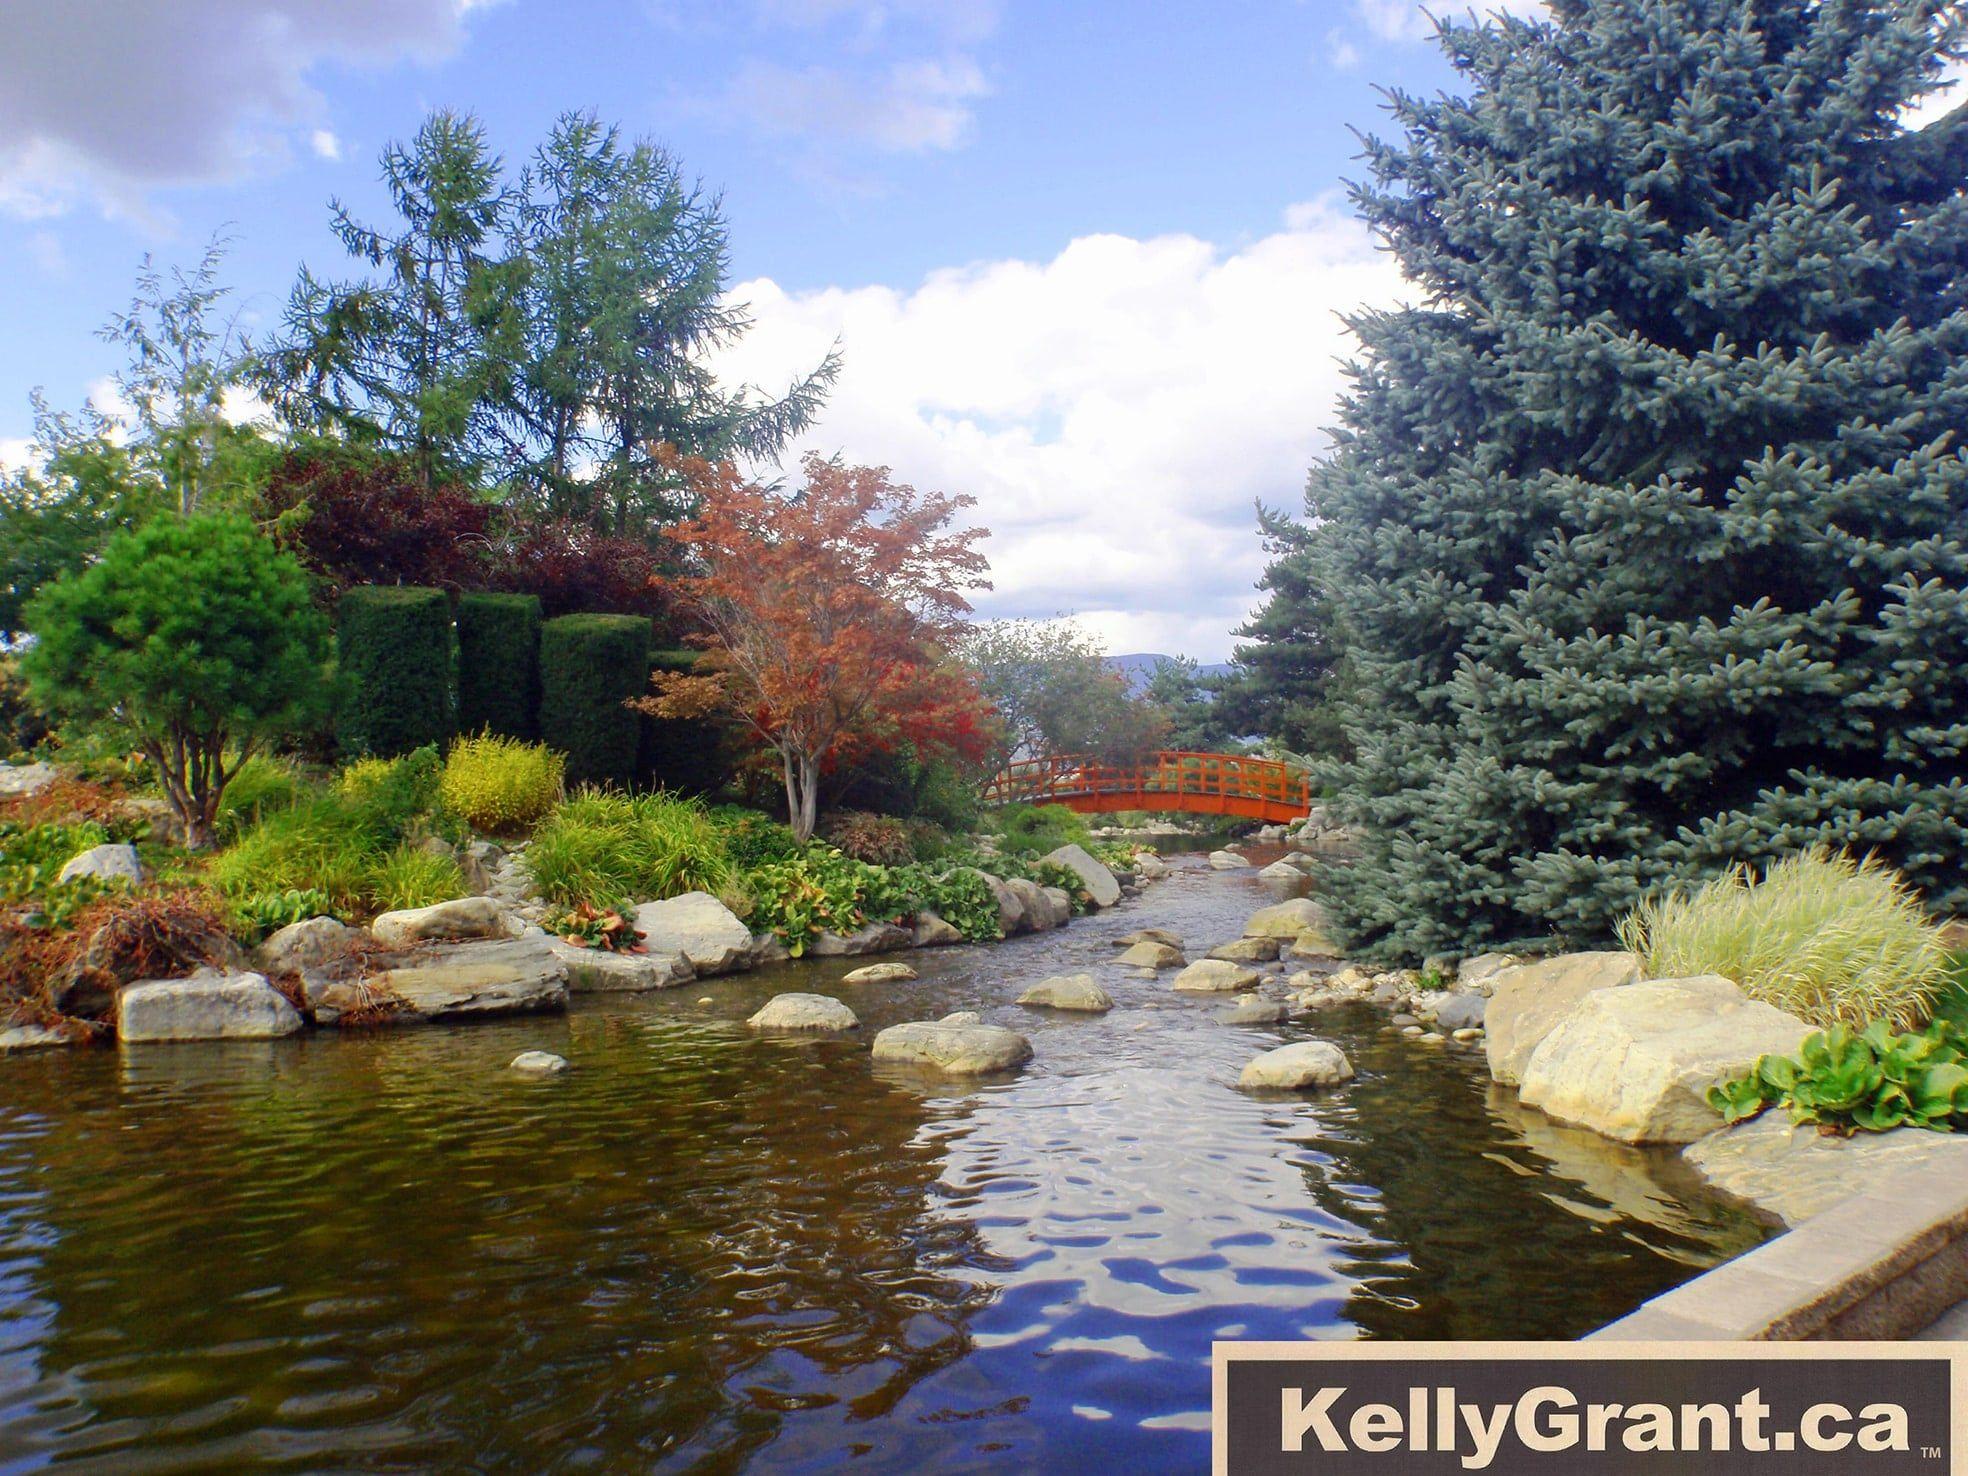 Kelly-Grant-BC golf club image 4